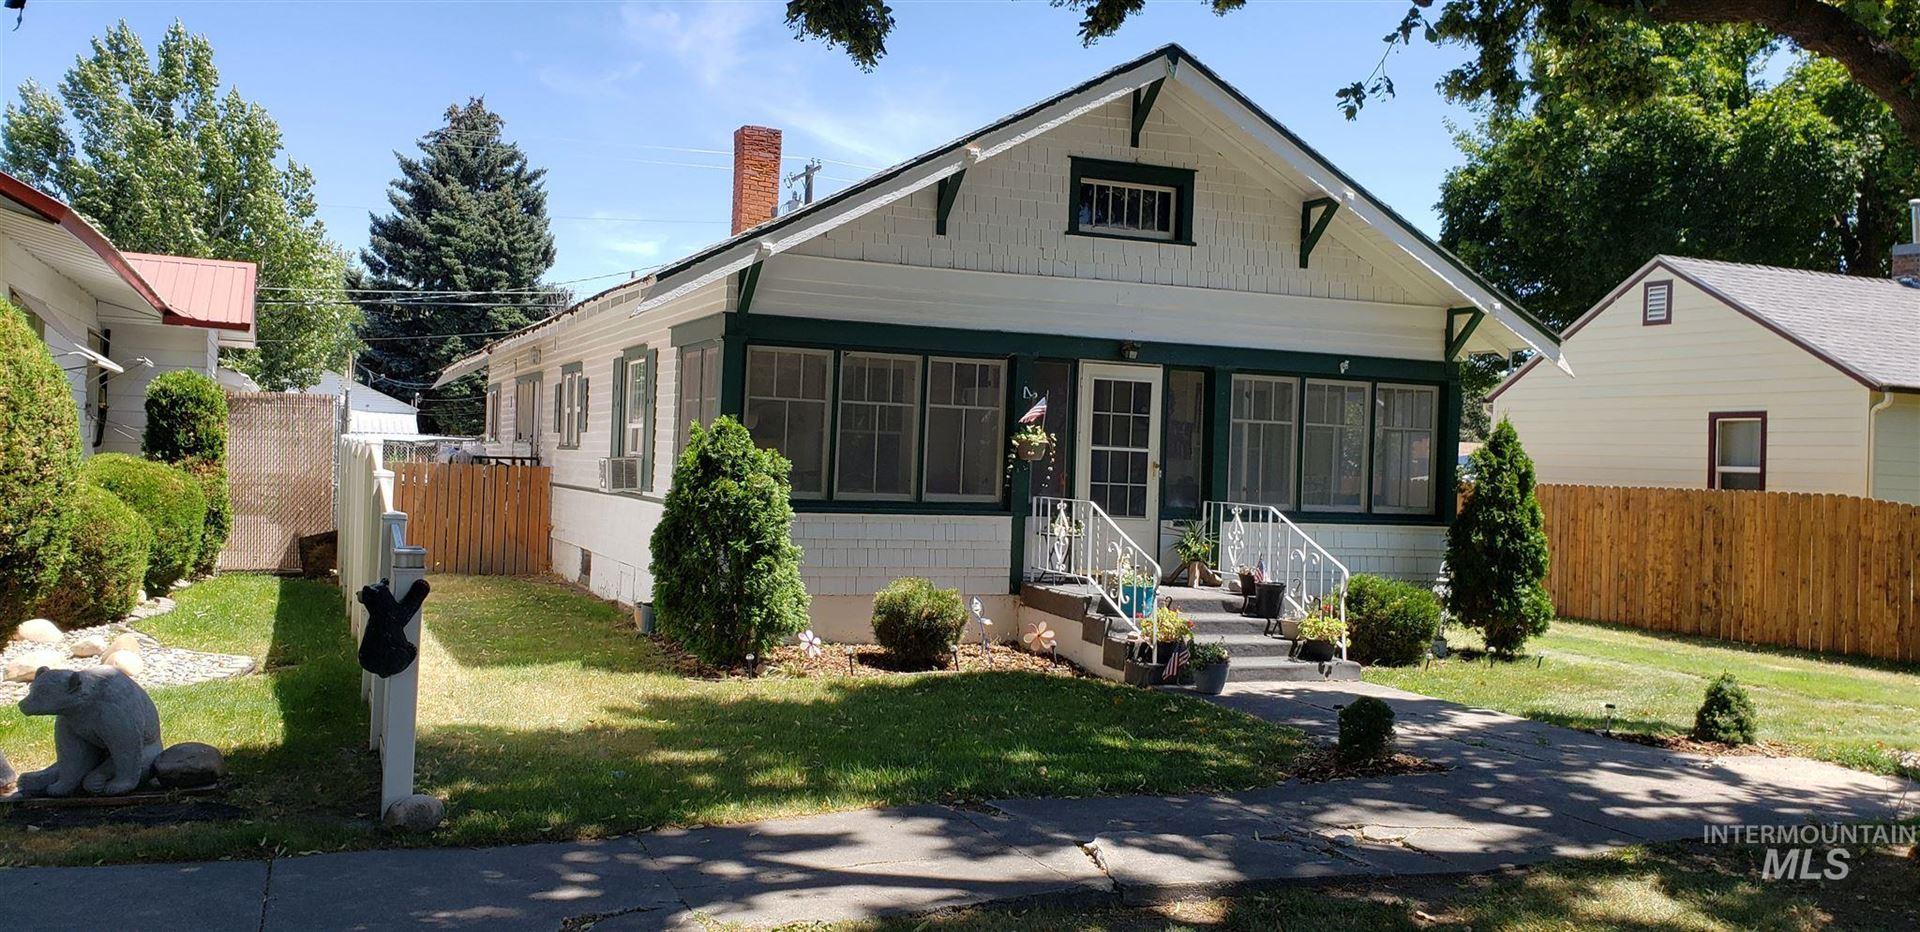 Photo of 334 California Street, Gooding, ID 83330 (MLS # 98774159)